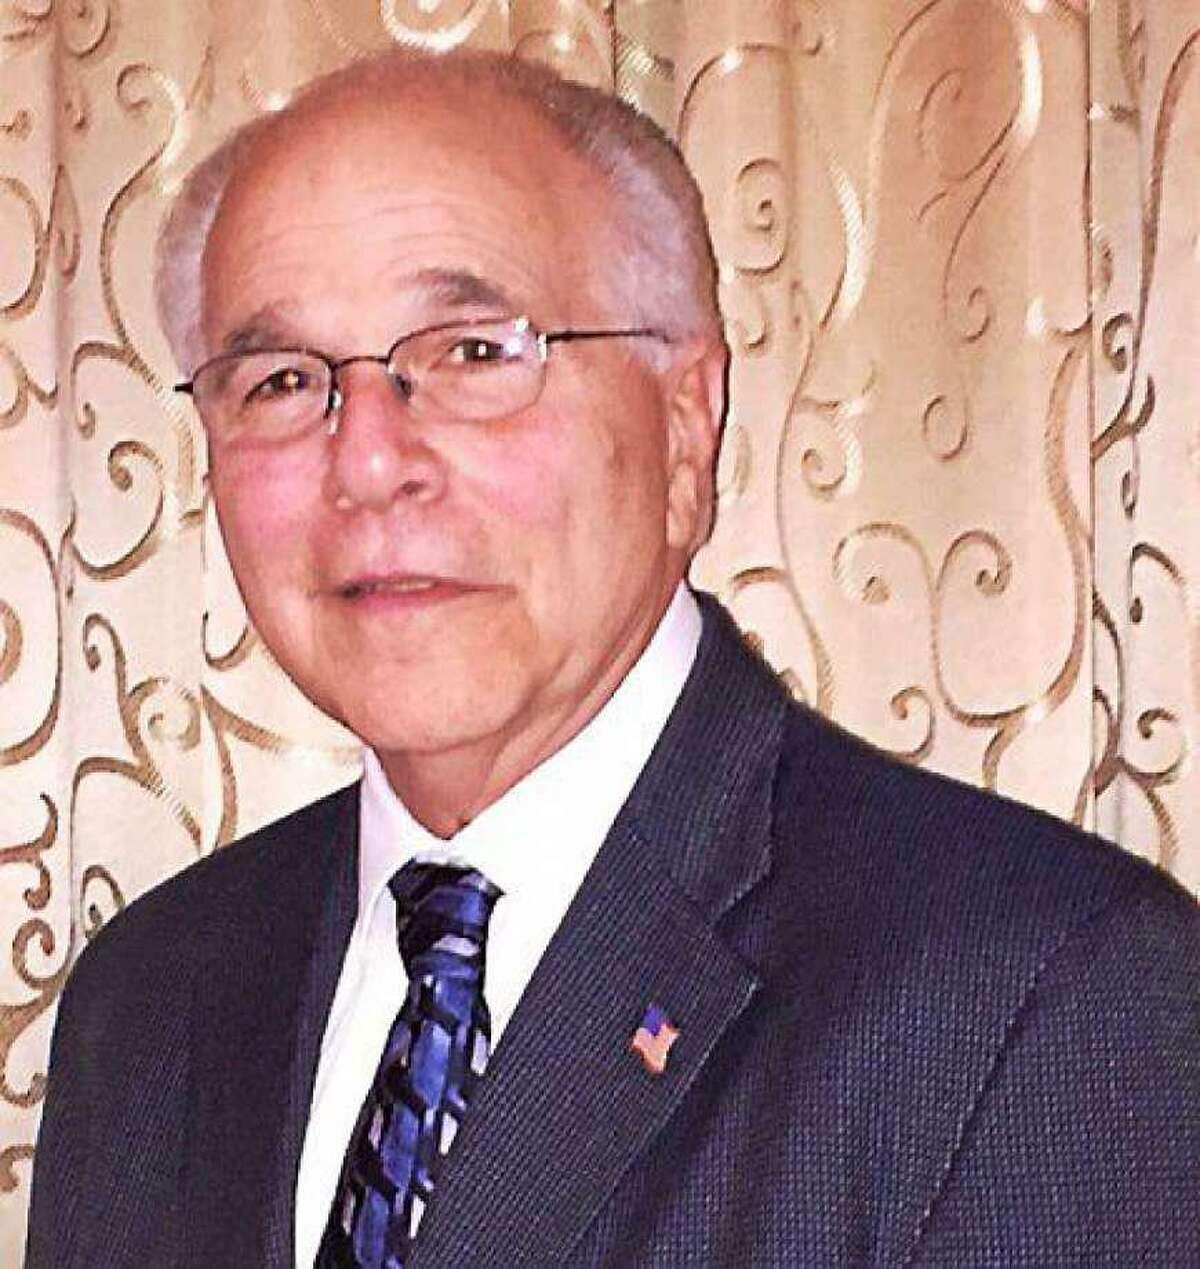 East Haven small businessman Sal Maltese announced